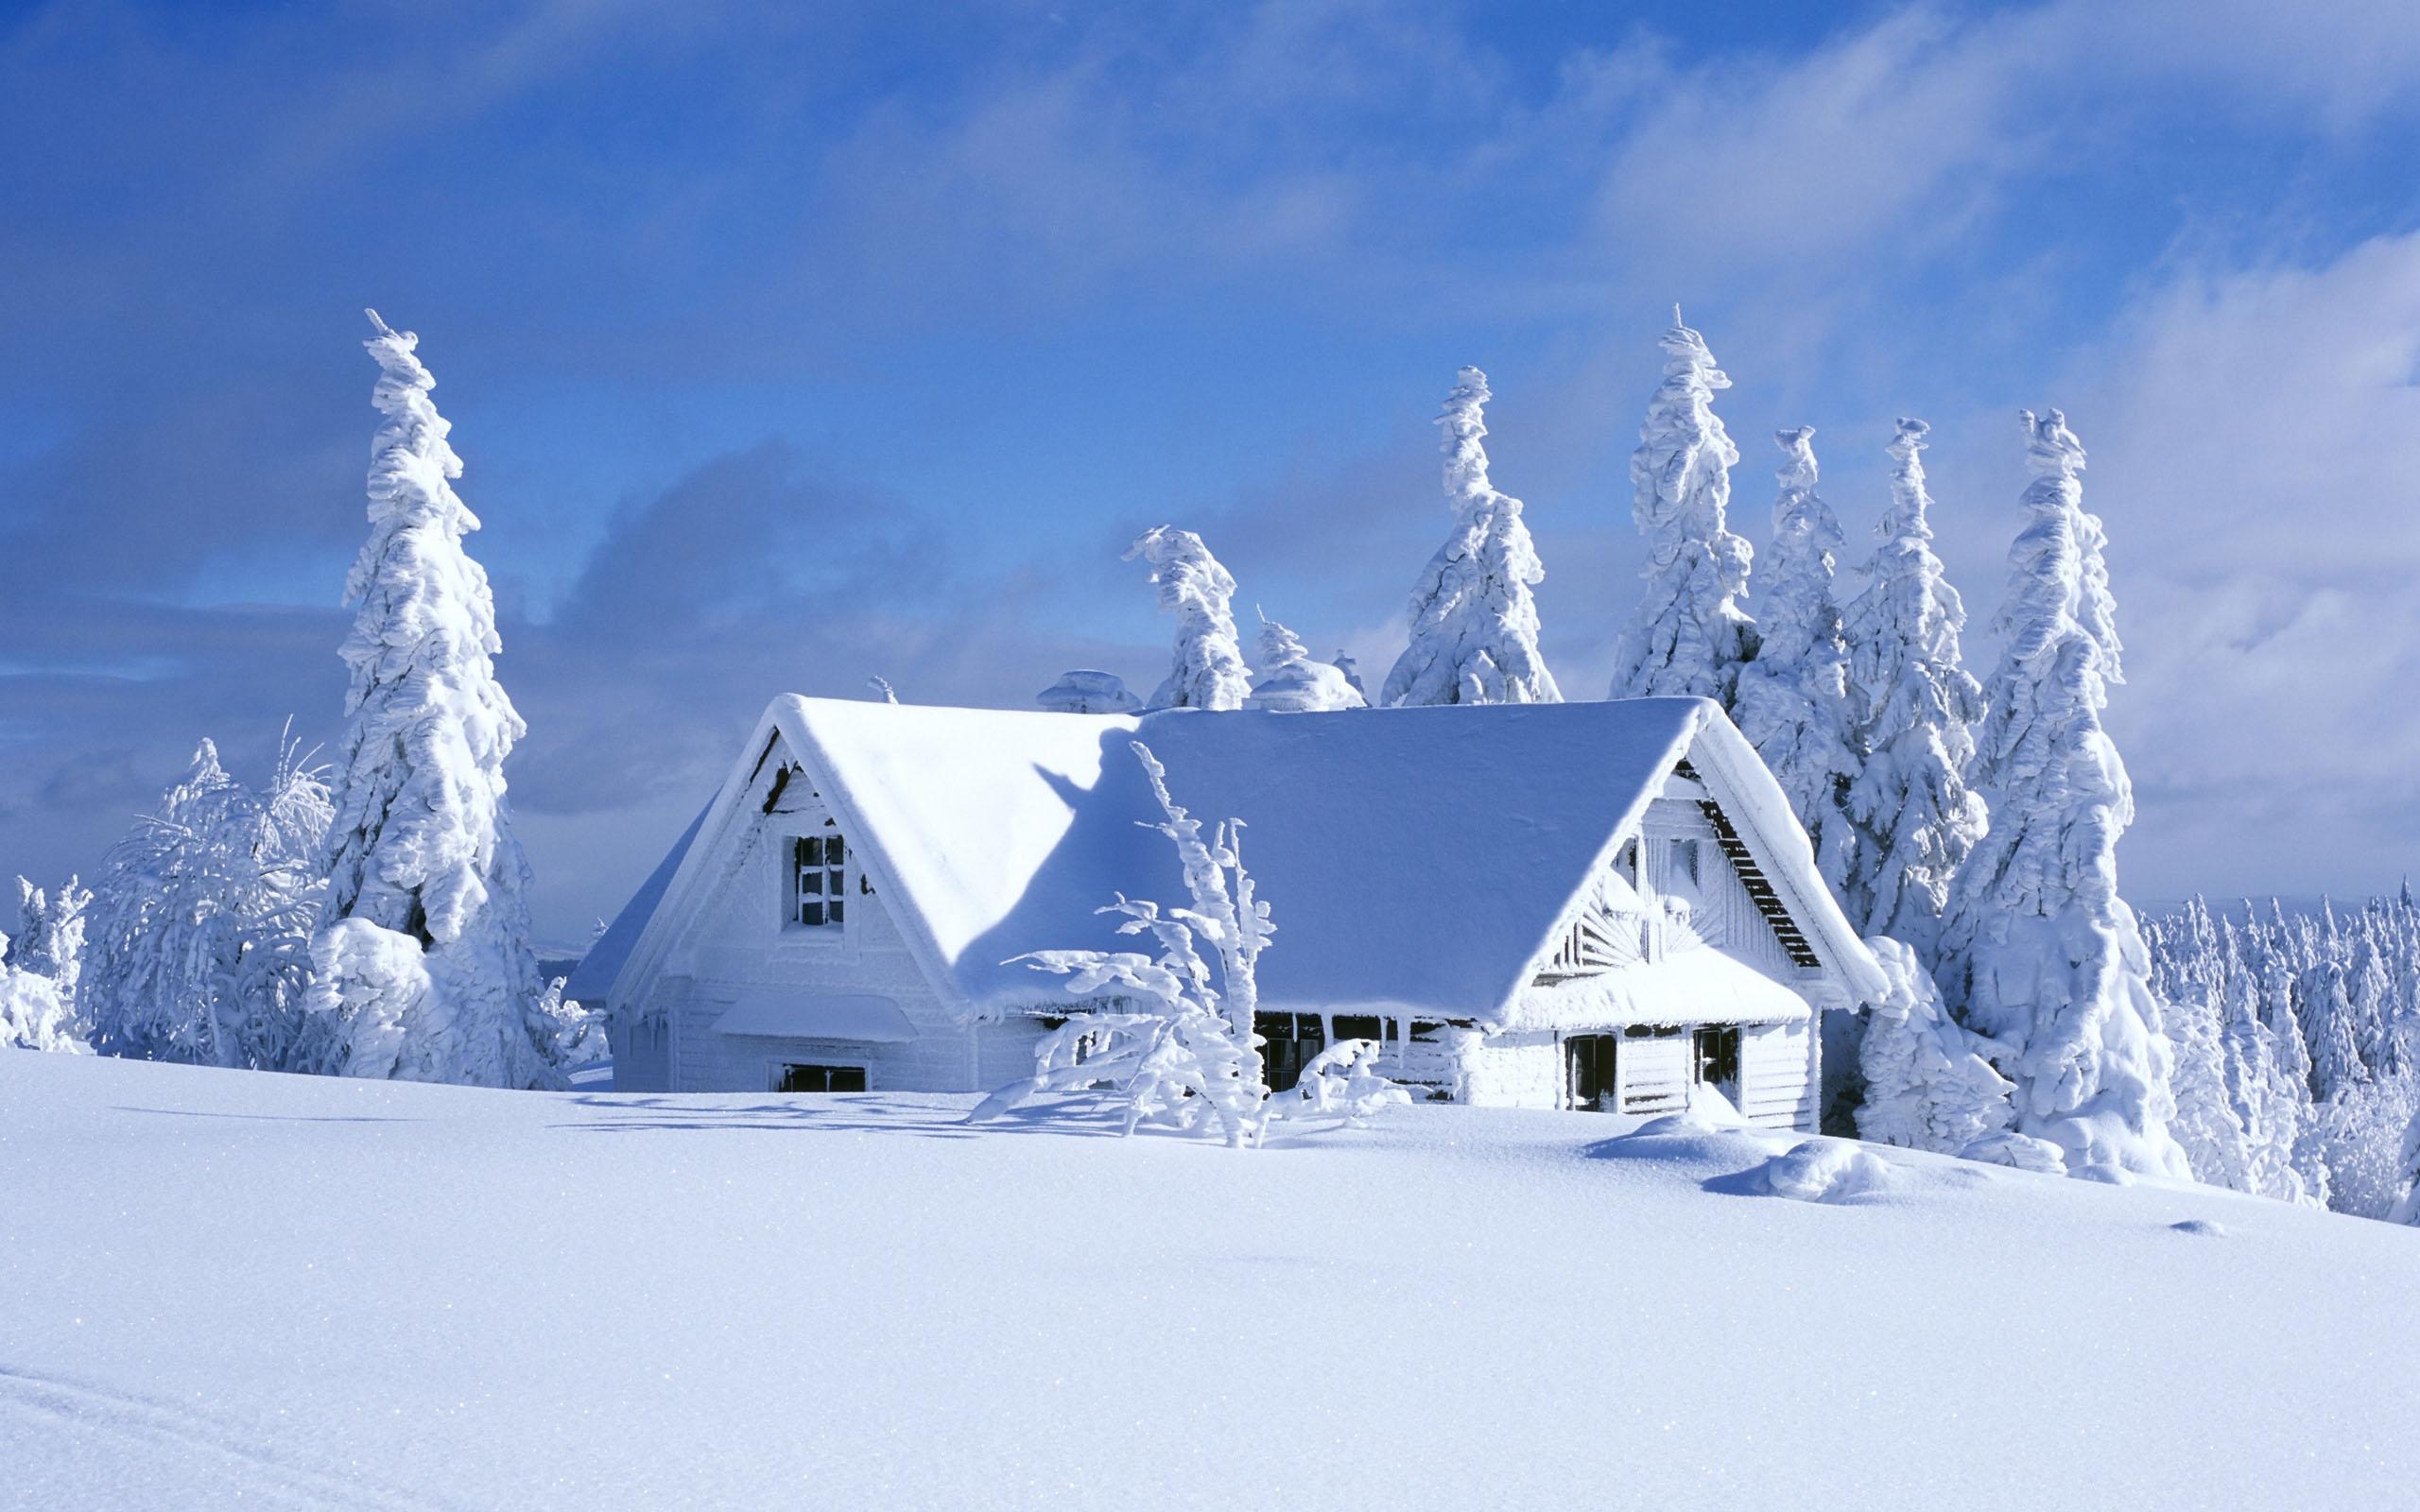 winter love wallpapers hd wallpaper 2560x1600